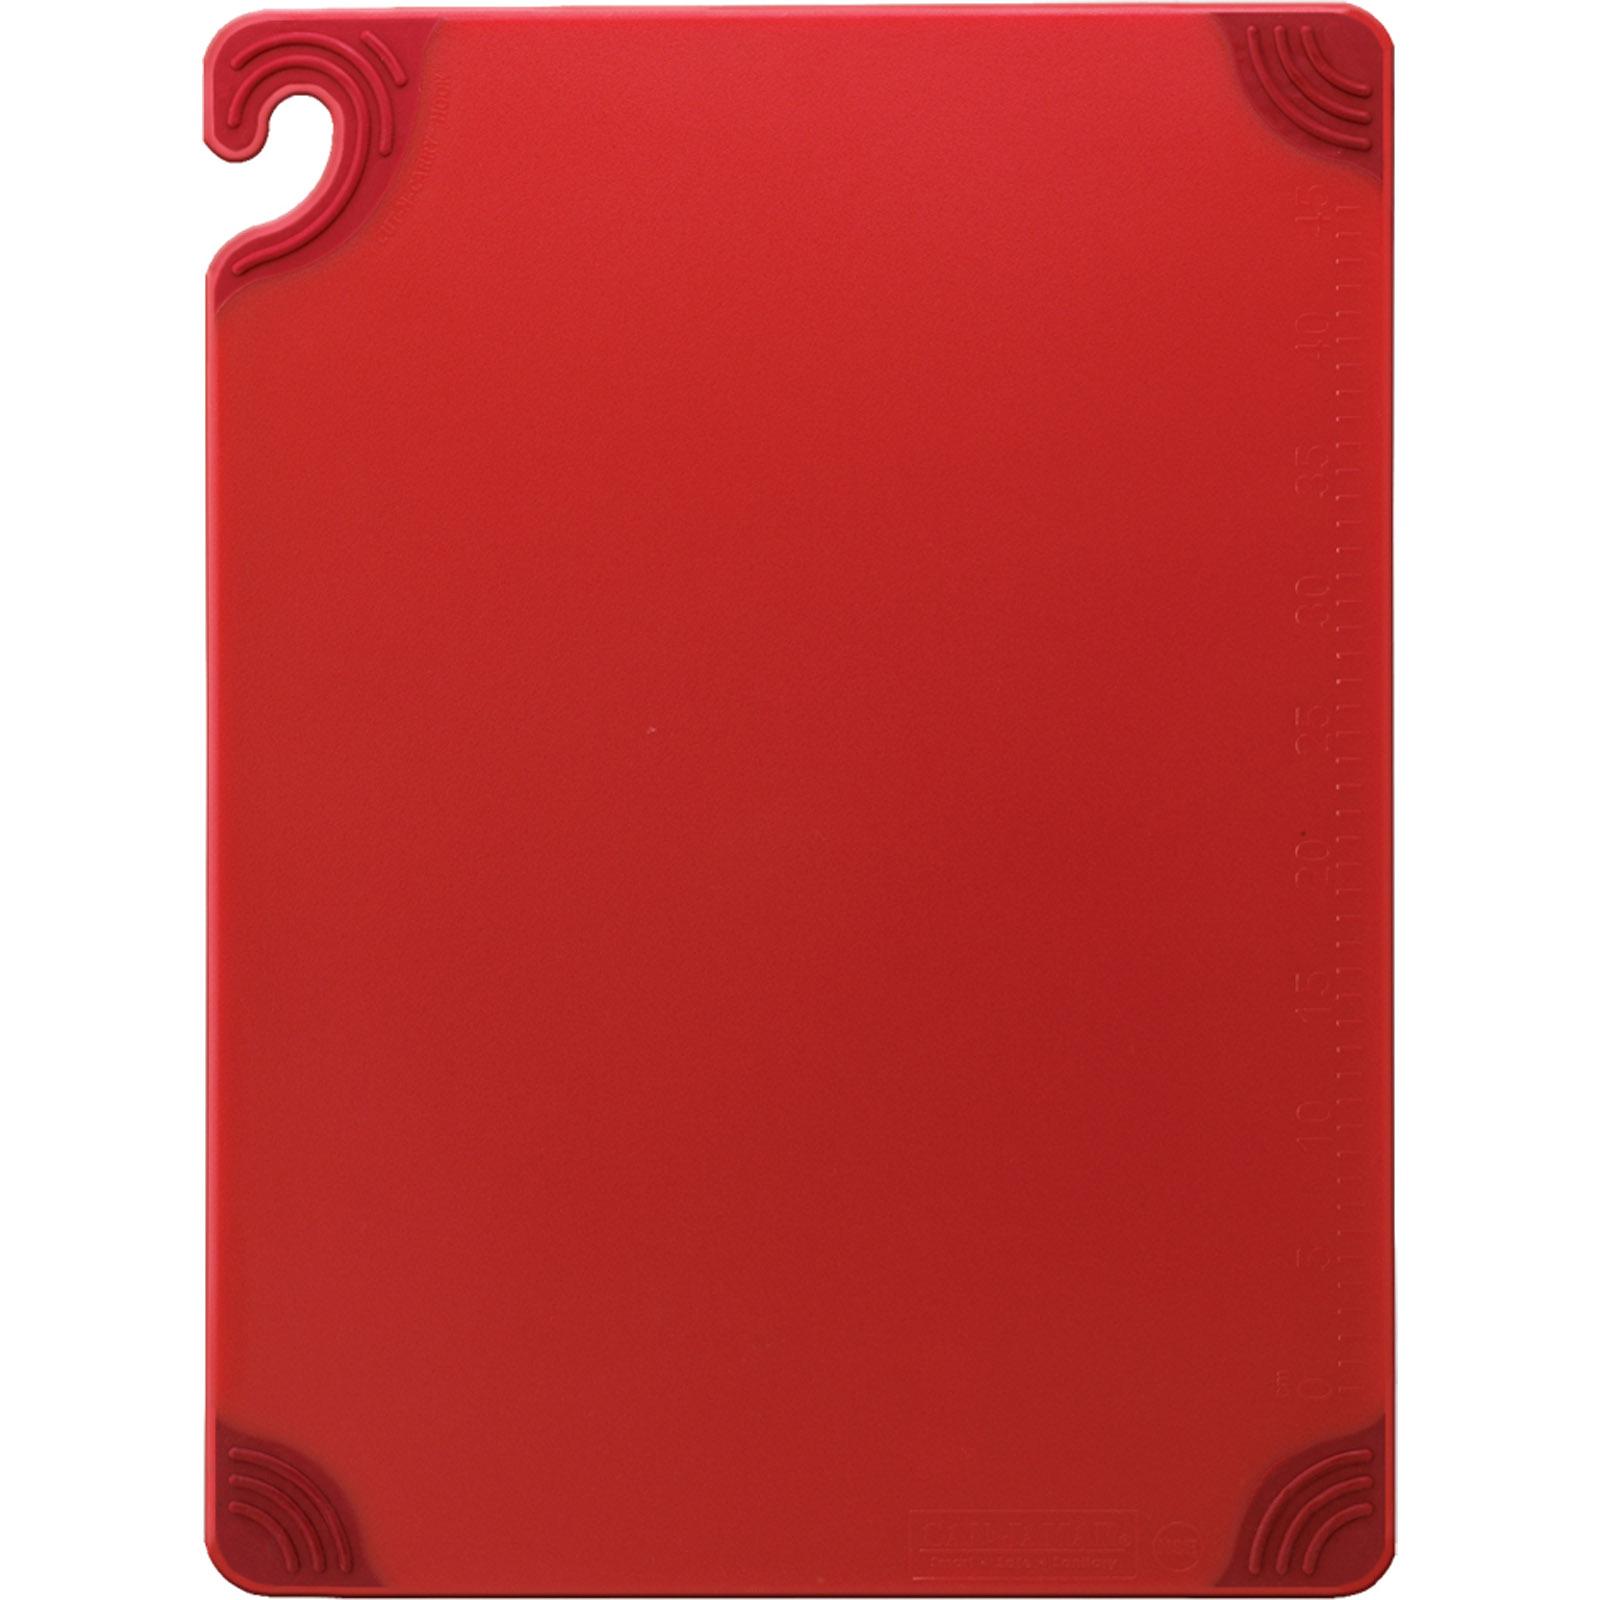 San Jamar CBG121812RD cutting board, plastic